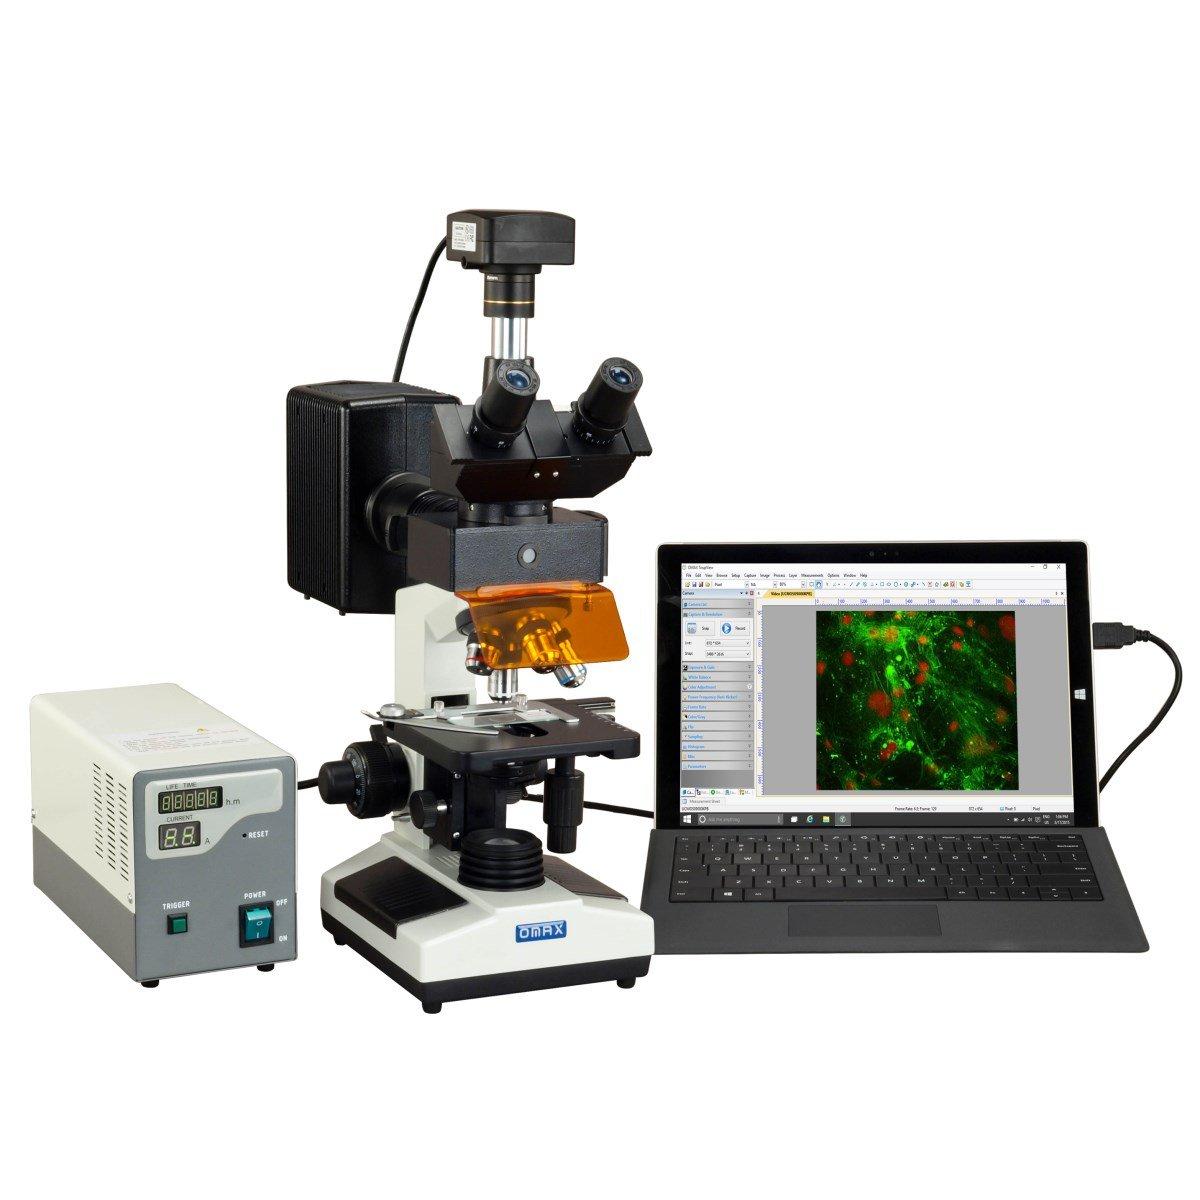 OMAX 40X1600X USB3 10MP Digital EPIFluorescence Trinocular Compound Biological Lab Microscope